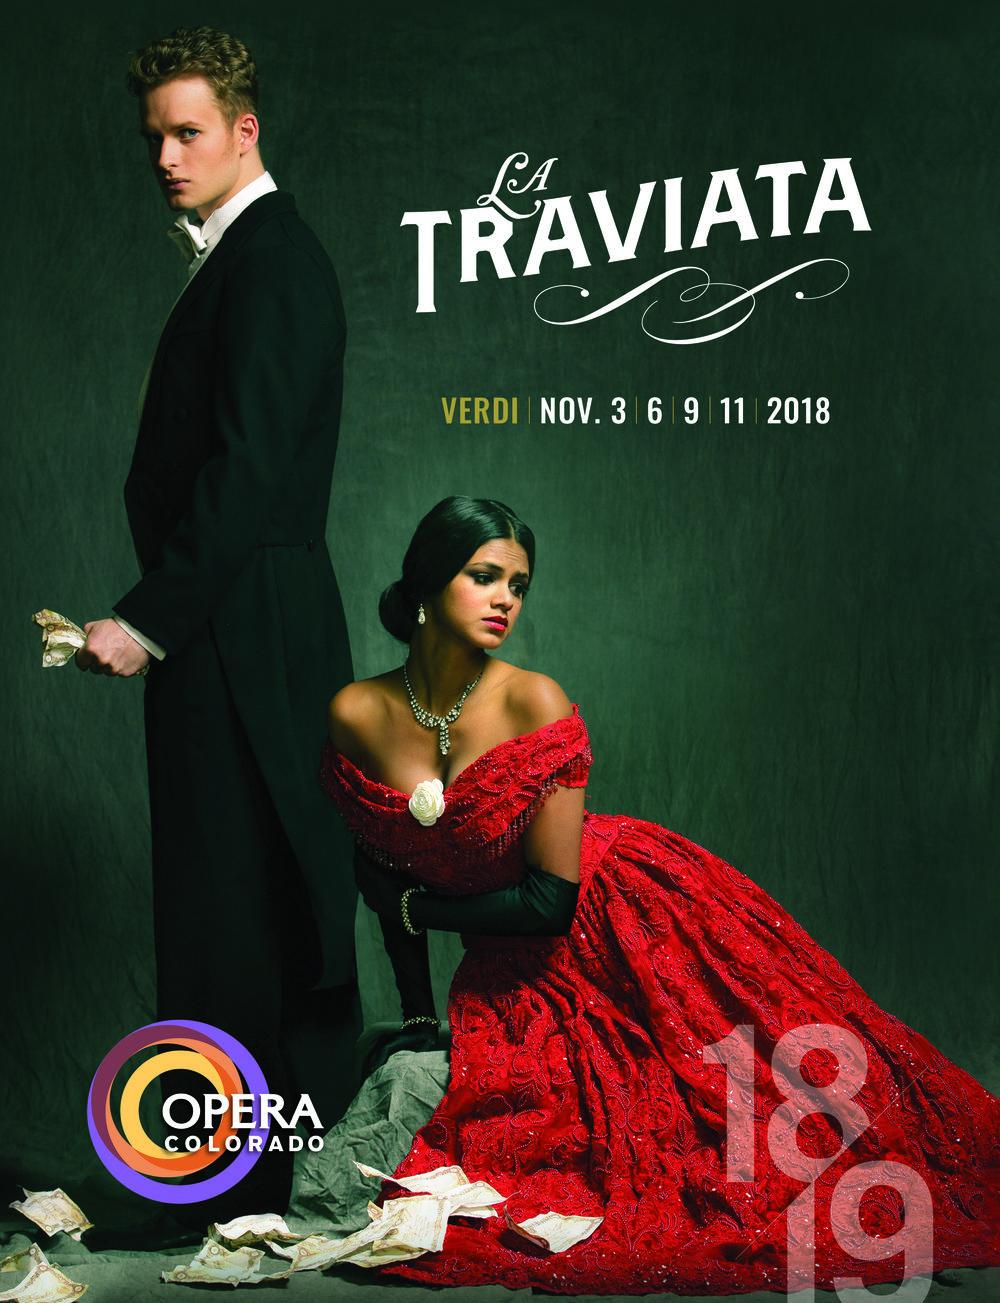 LaTraviata_cover.jpg